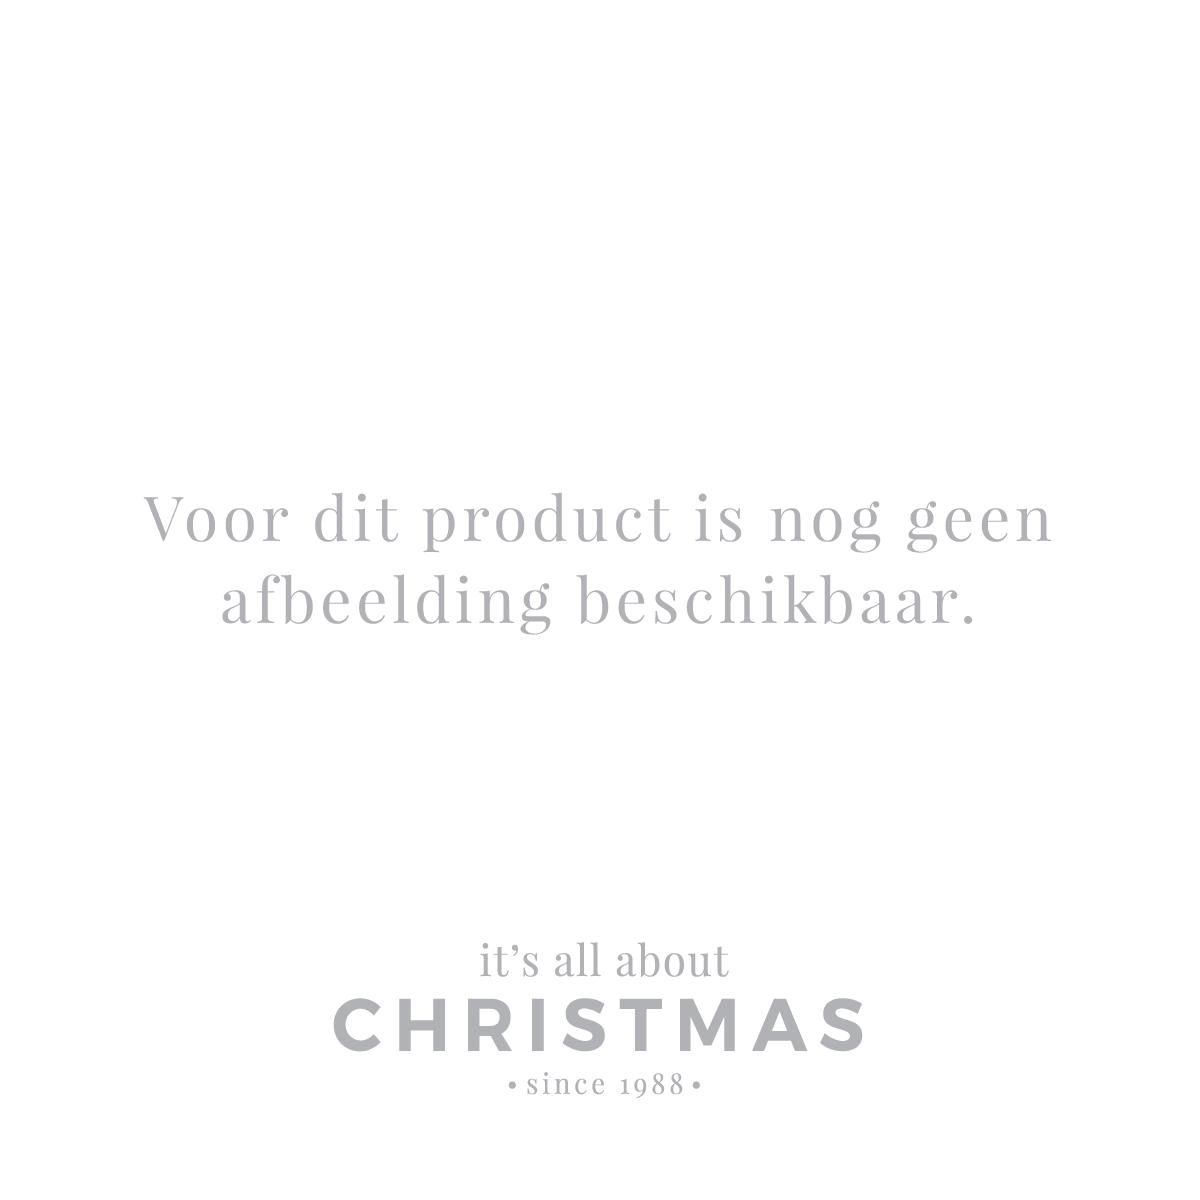 XXXL Weihnachtskugel blaugrün matt, Kunststoff, 25 cm